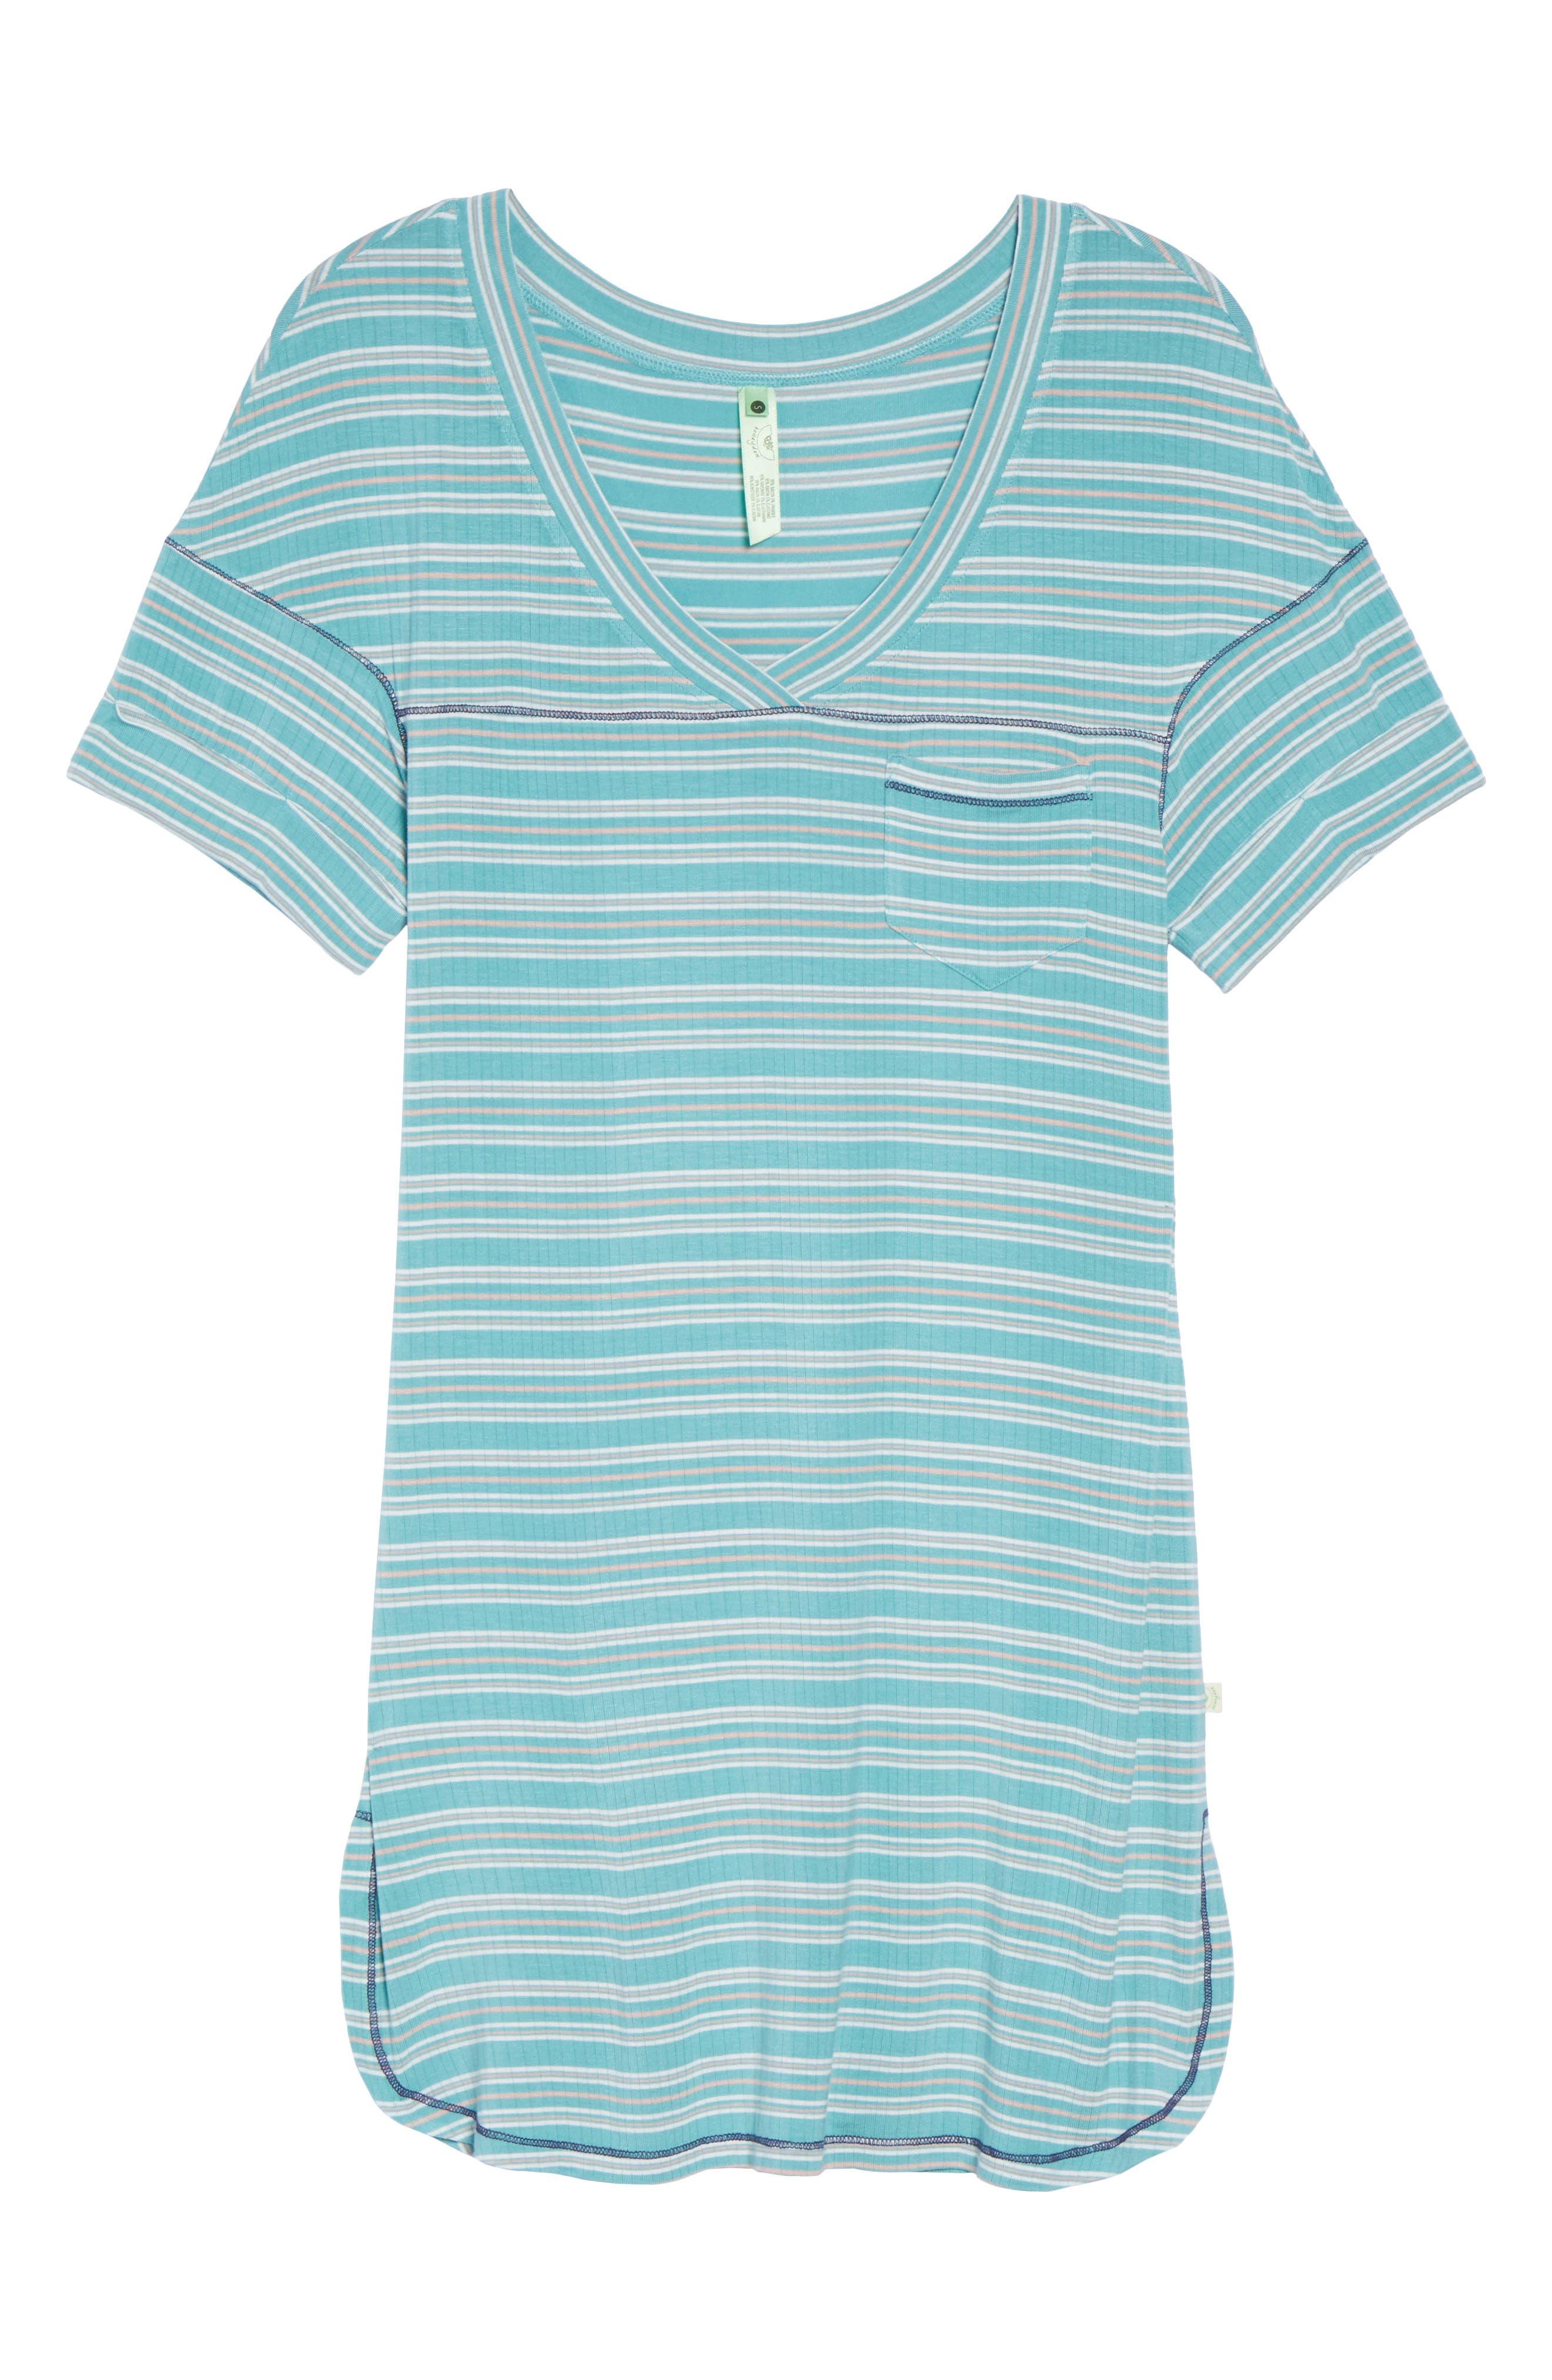 Rib Sleep Shirt,                             Alternate thumbnail 6, color,                             300